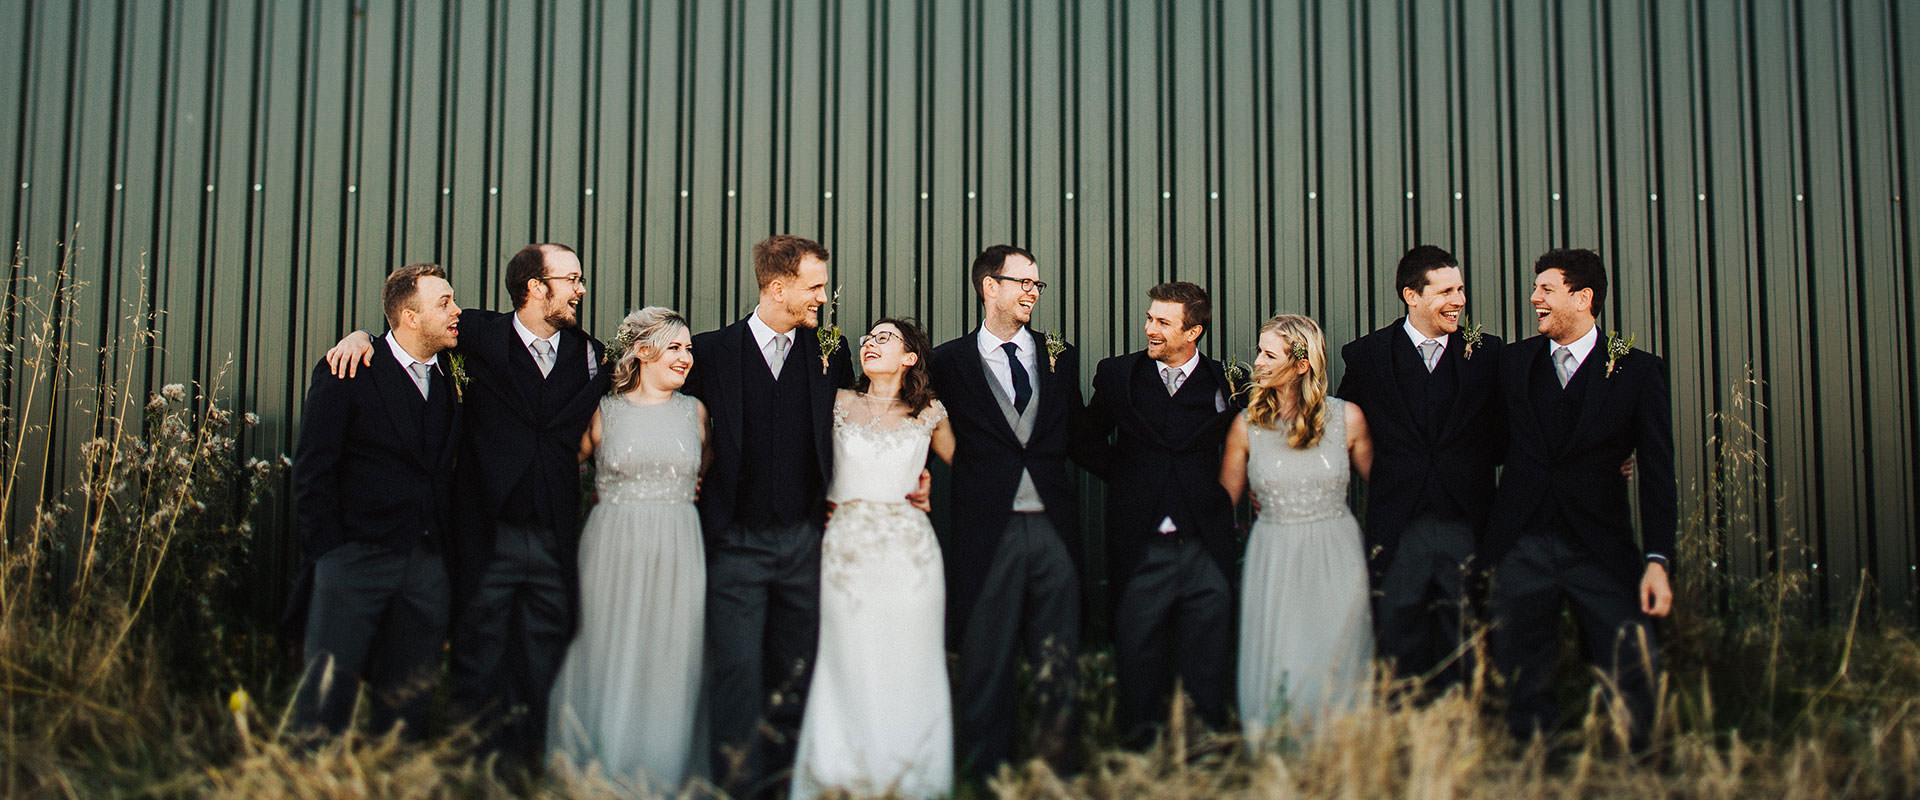 Fun outdoor wedding Cheshire